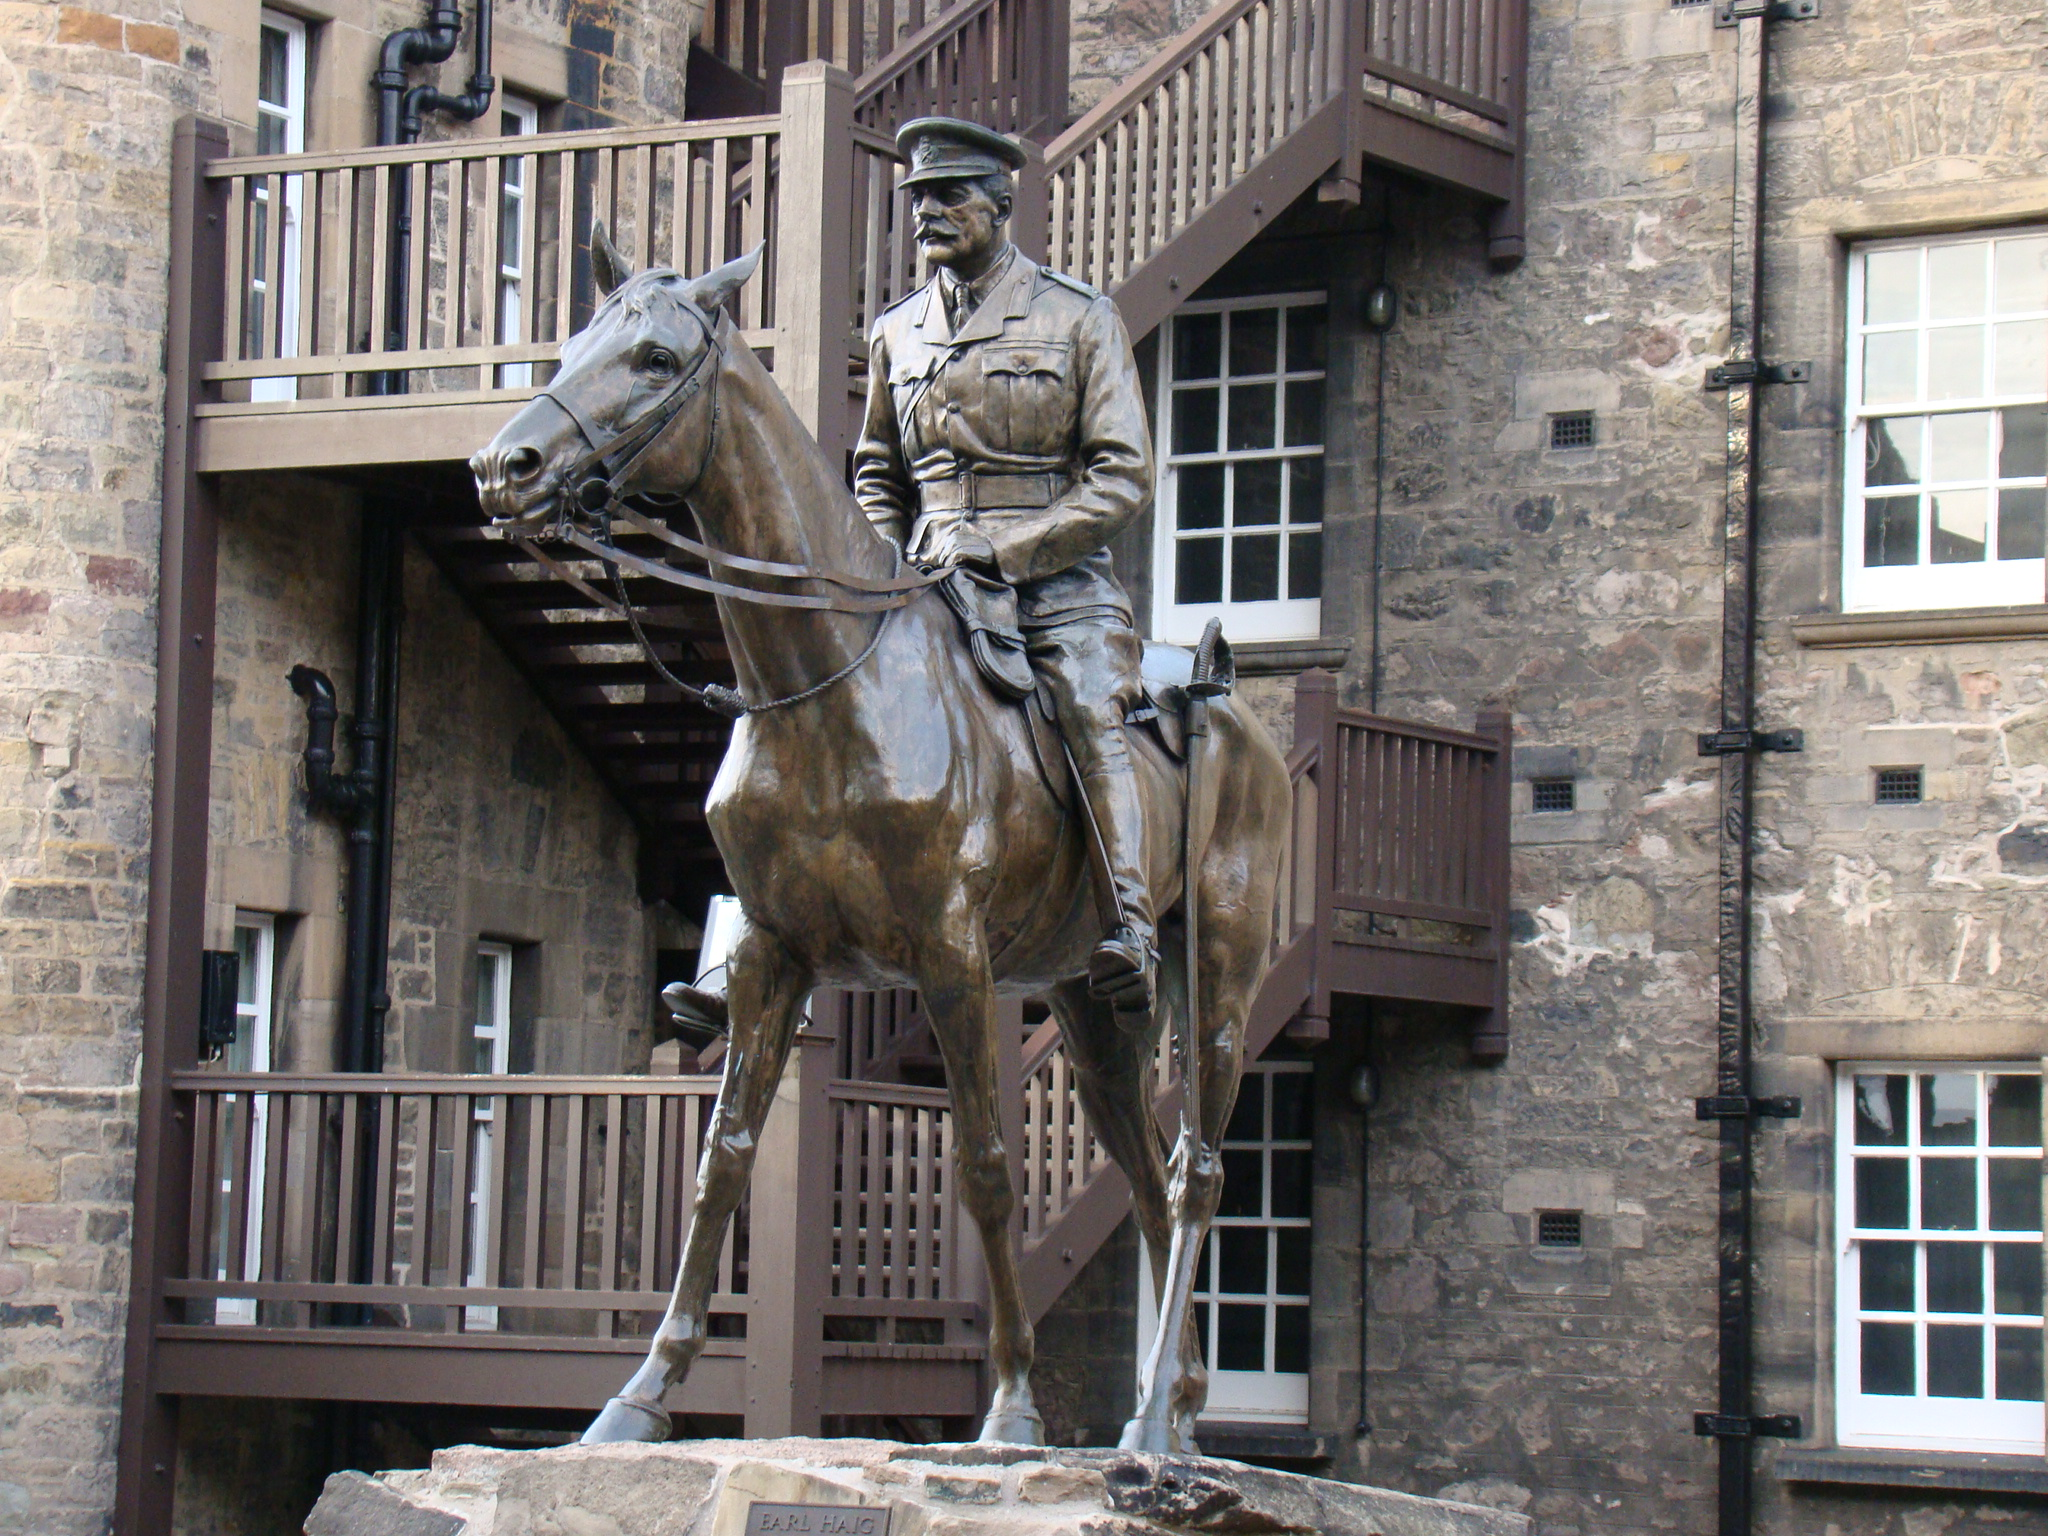 Museu do Exército - Castelo de Edimburgo